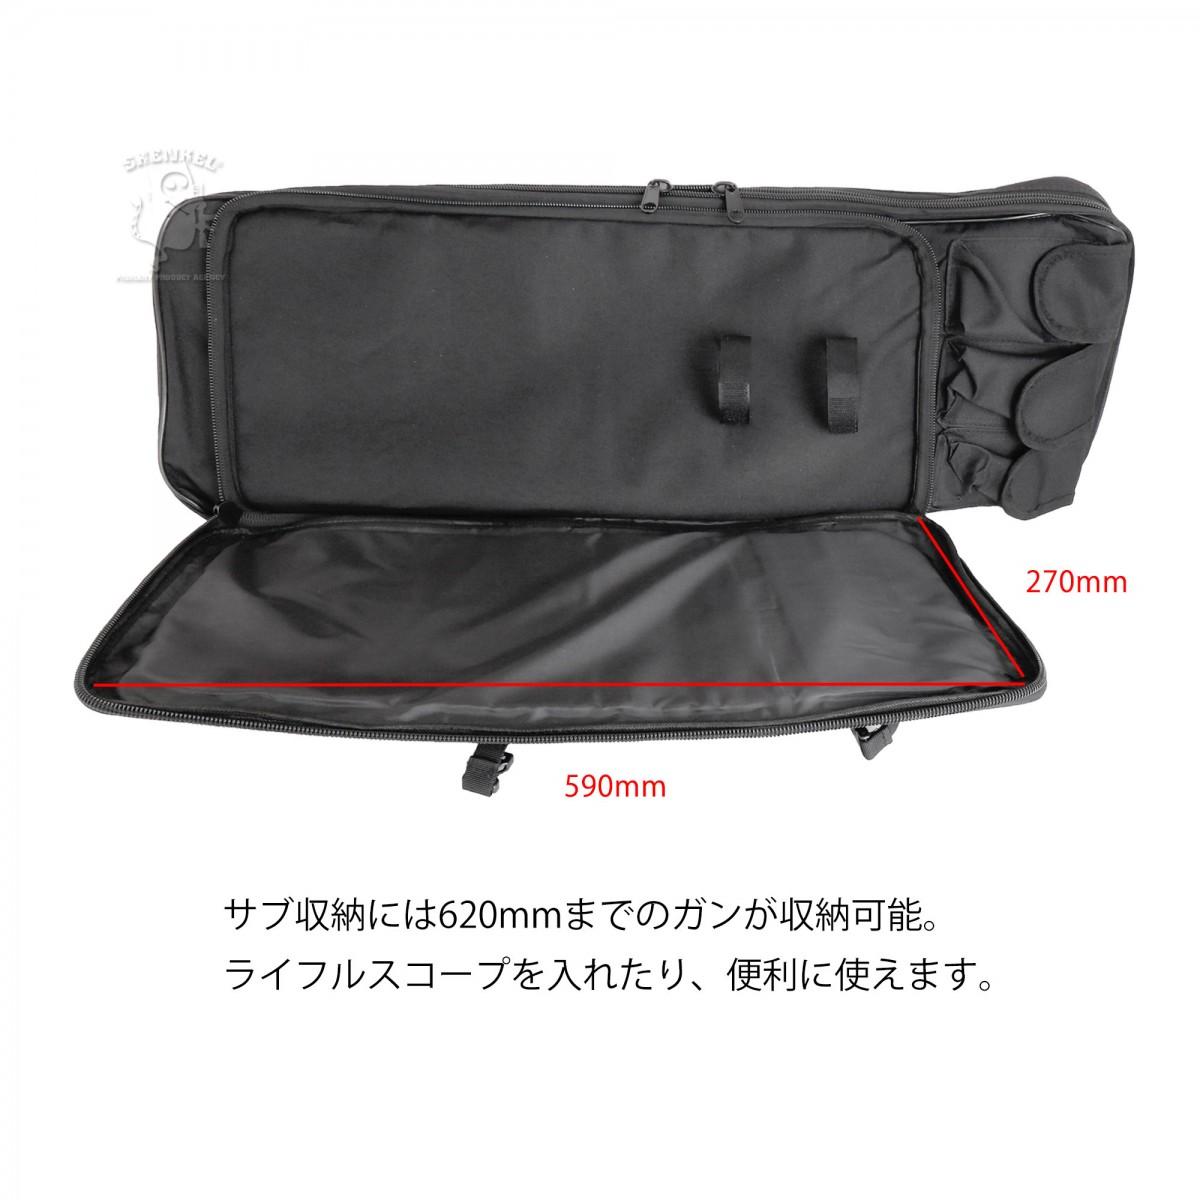 SHENKEL ダブル ガンケース ライフルケース 80~100cm ソフトタイプ BK 7ポケット 830x280 バック サバゲー サバイバルゲーム装備